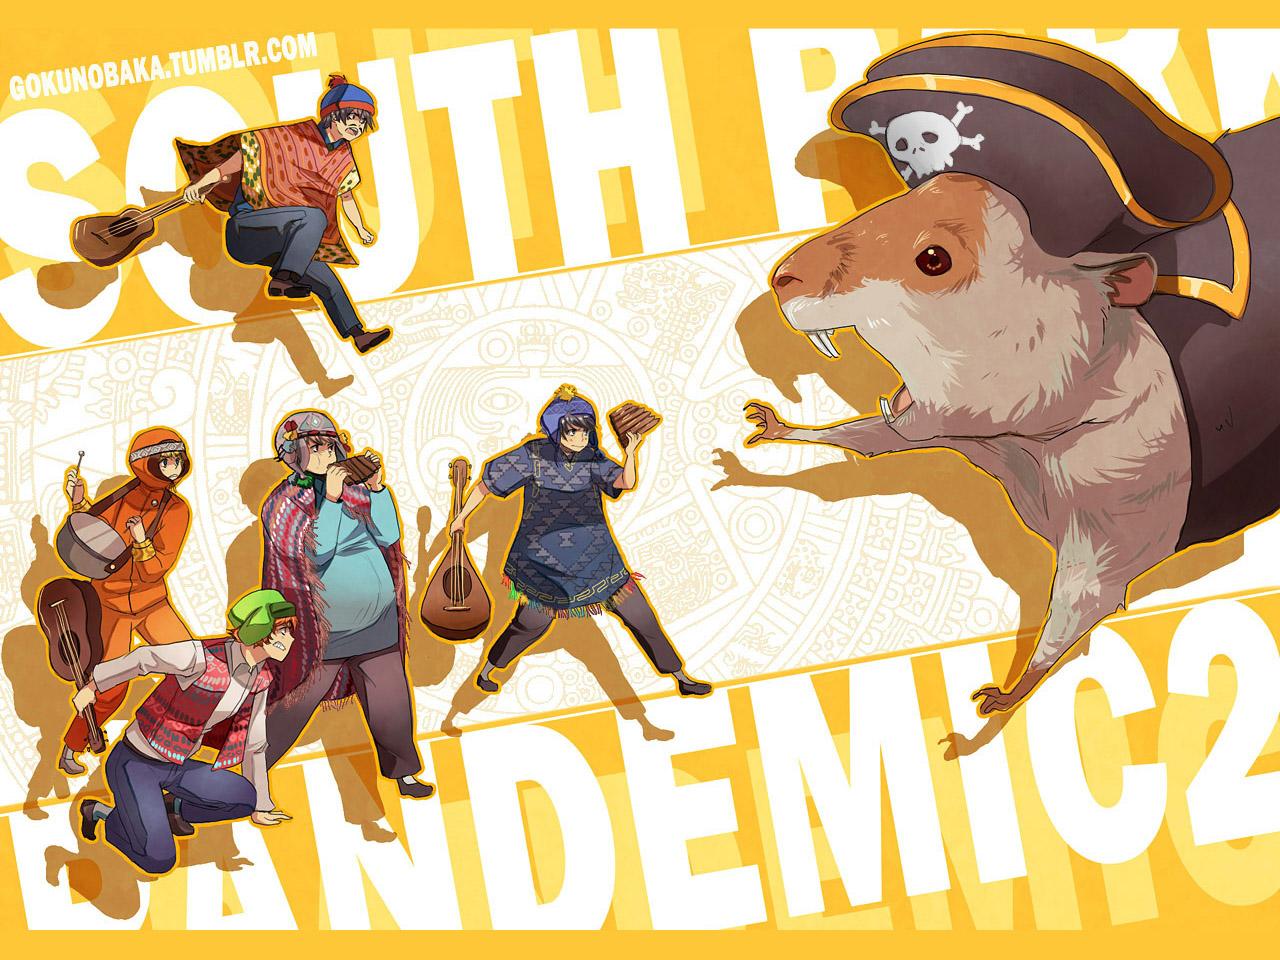 +SOUTHPARK -Pandemic2+ by goku-no-baka